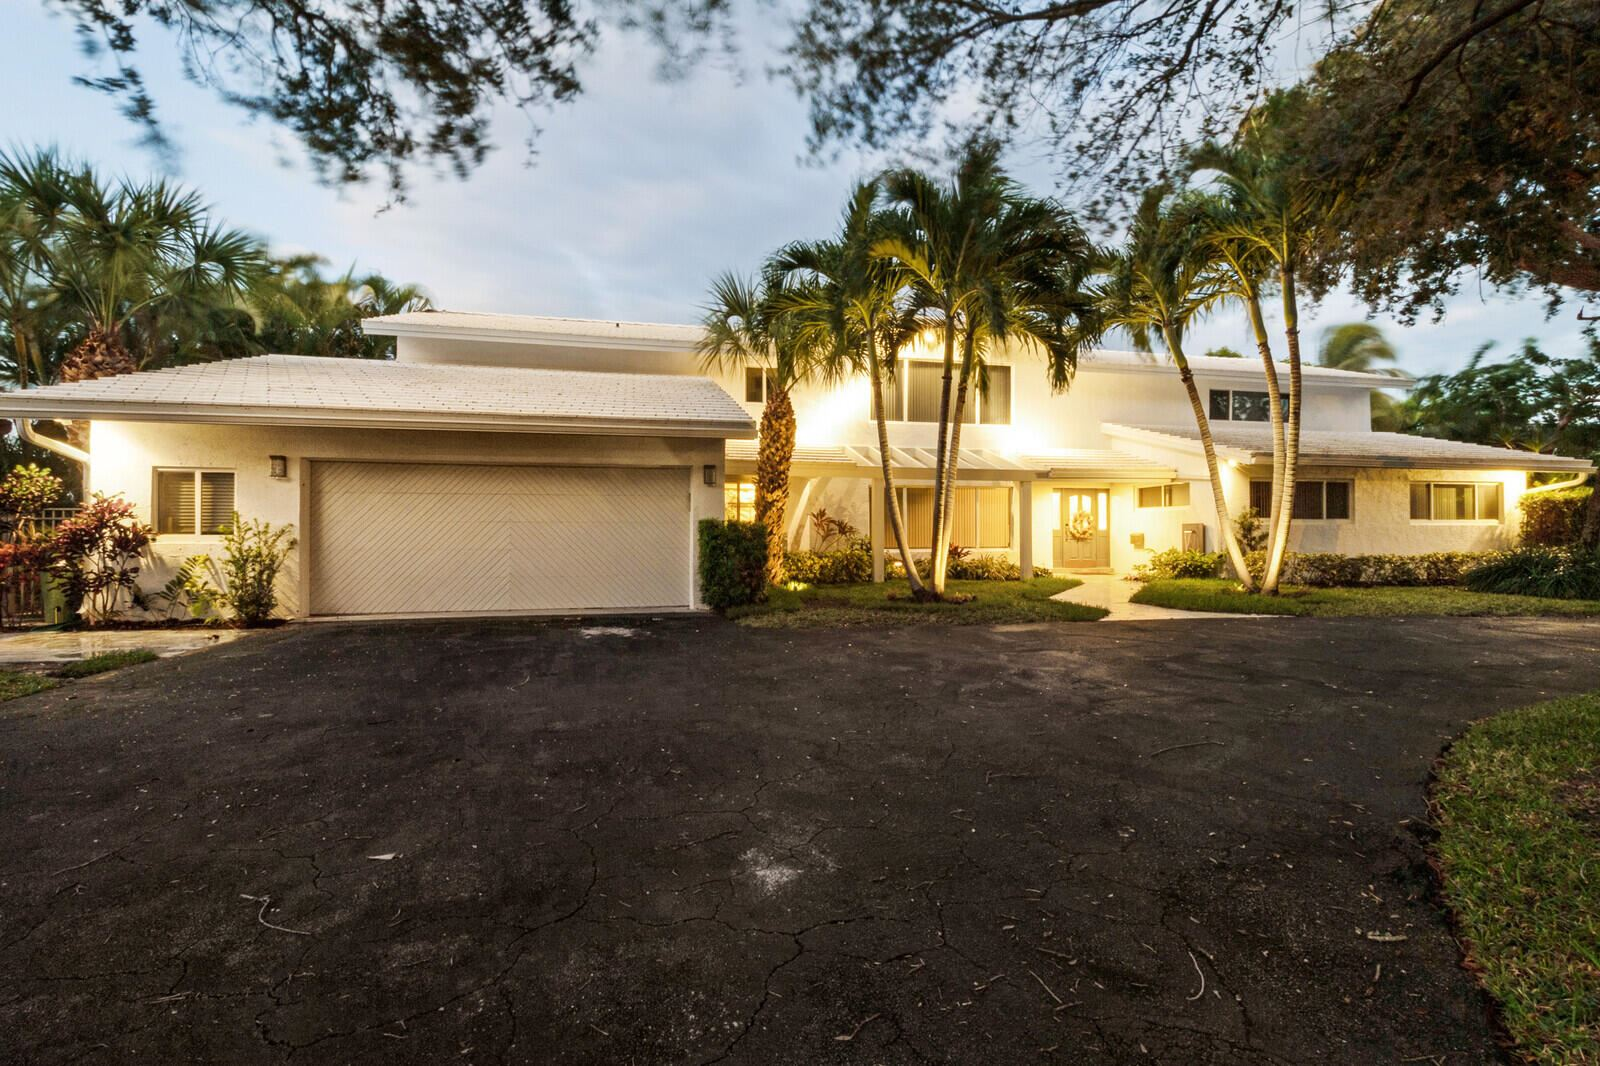 Photo of 2601 NE 37th Drive, Fort Lauderdale, FL 33308 (MLS # RX-10716757)